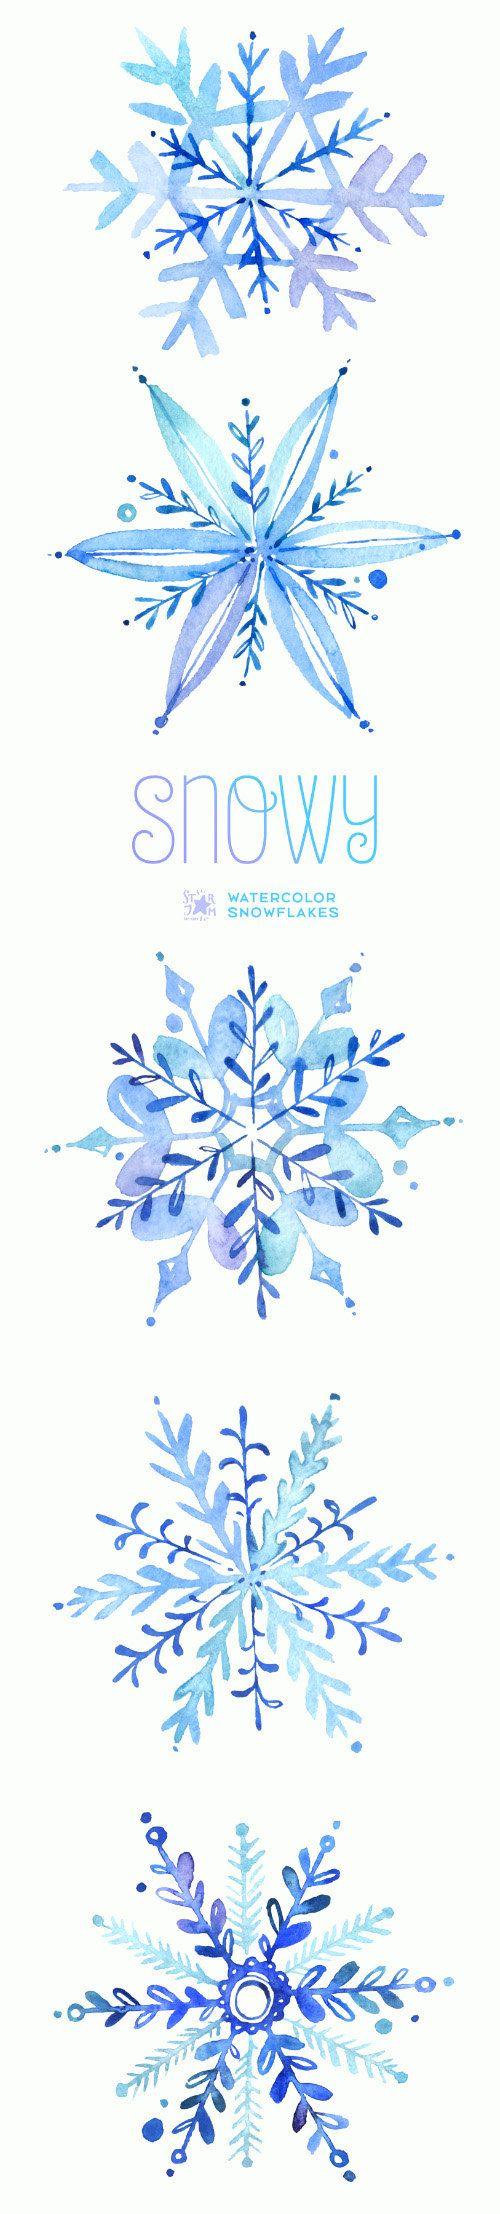 Watercolor winter clipart graphic transparent stock Snowy. Watercolor winter clipart, snowflakes, christmas ... graphic transparent stock